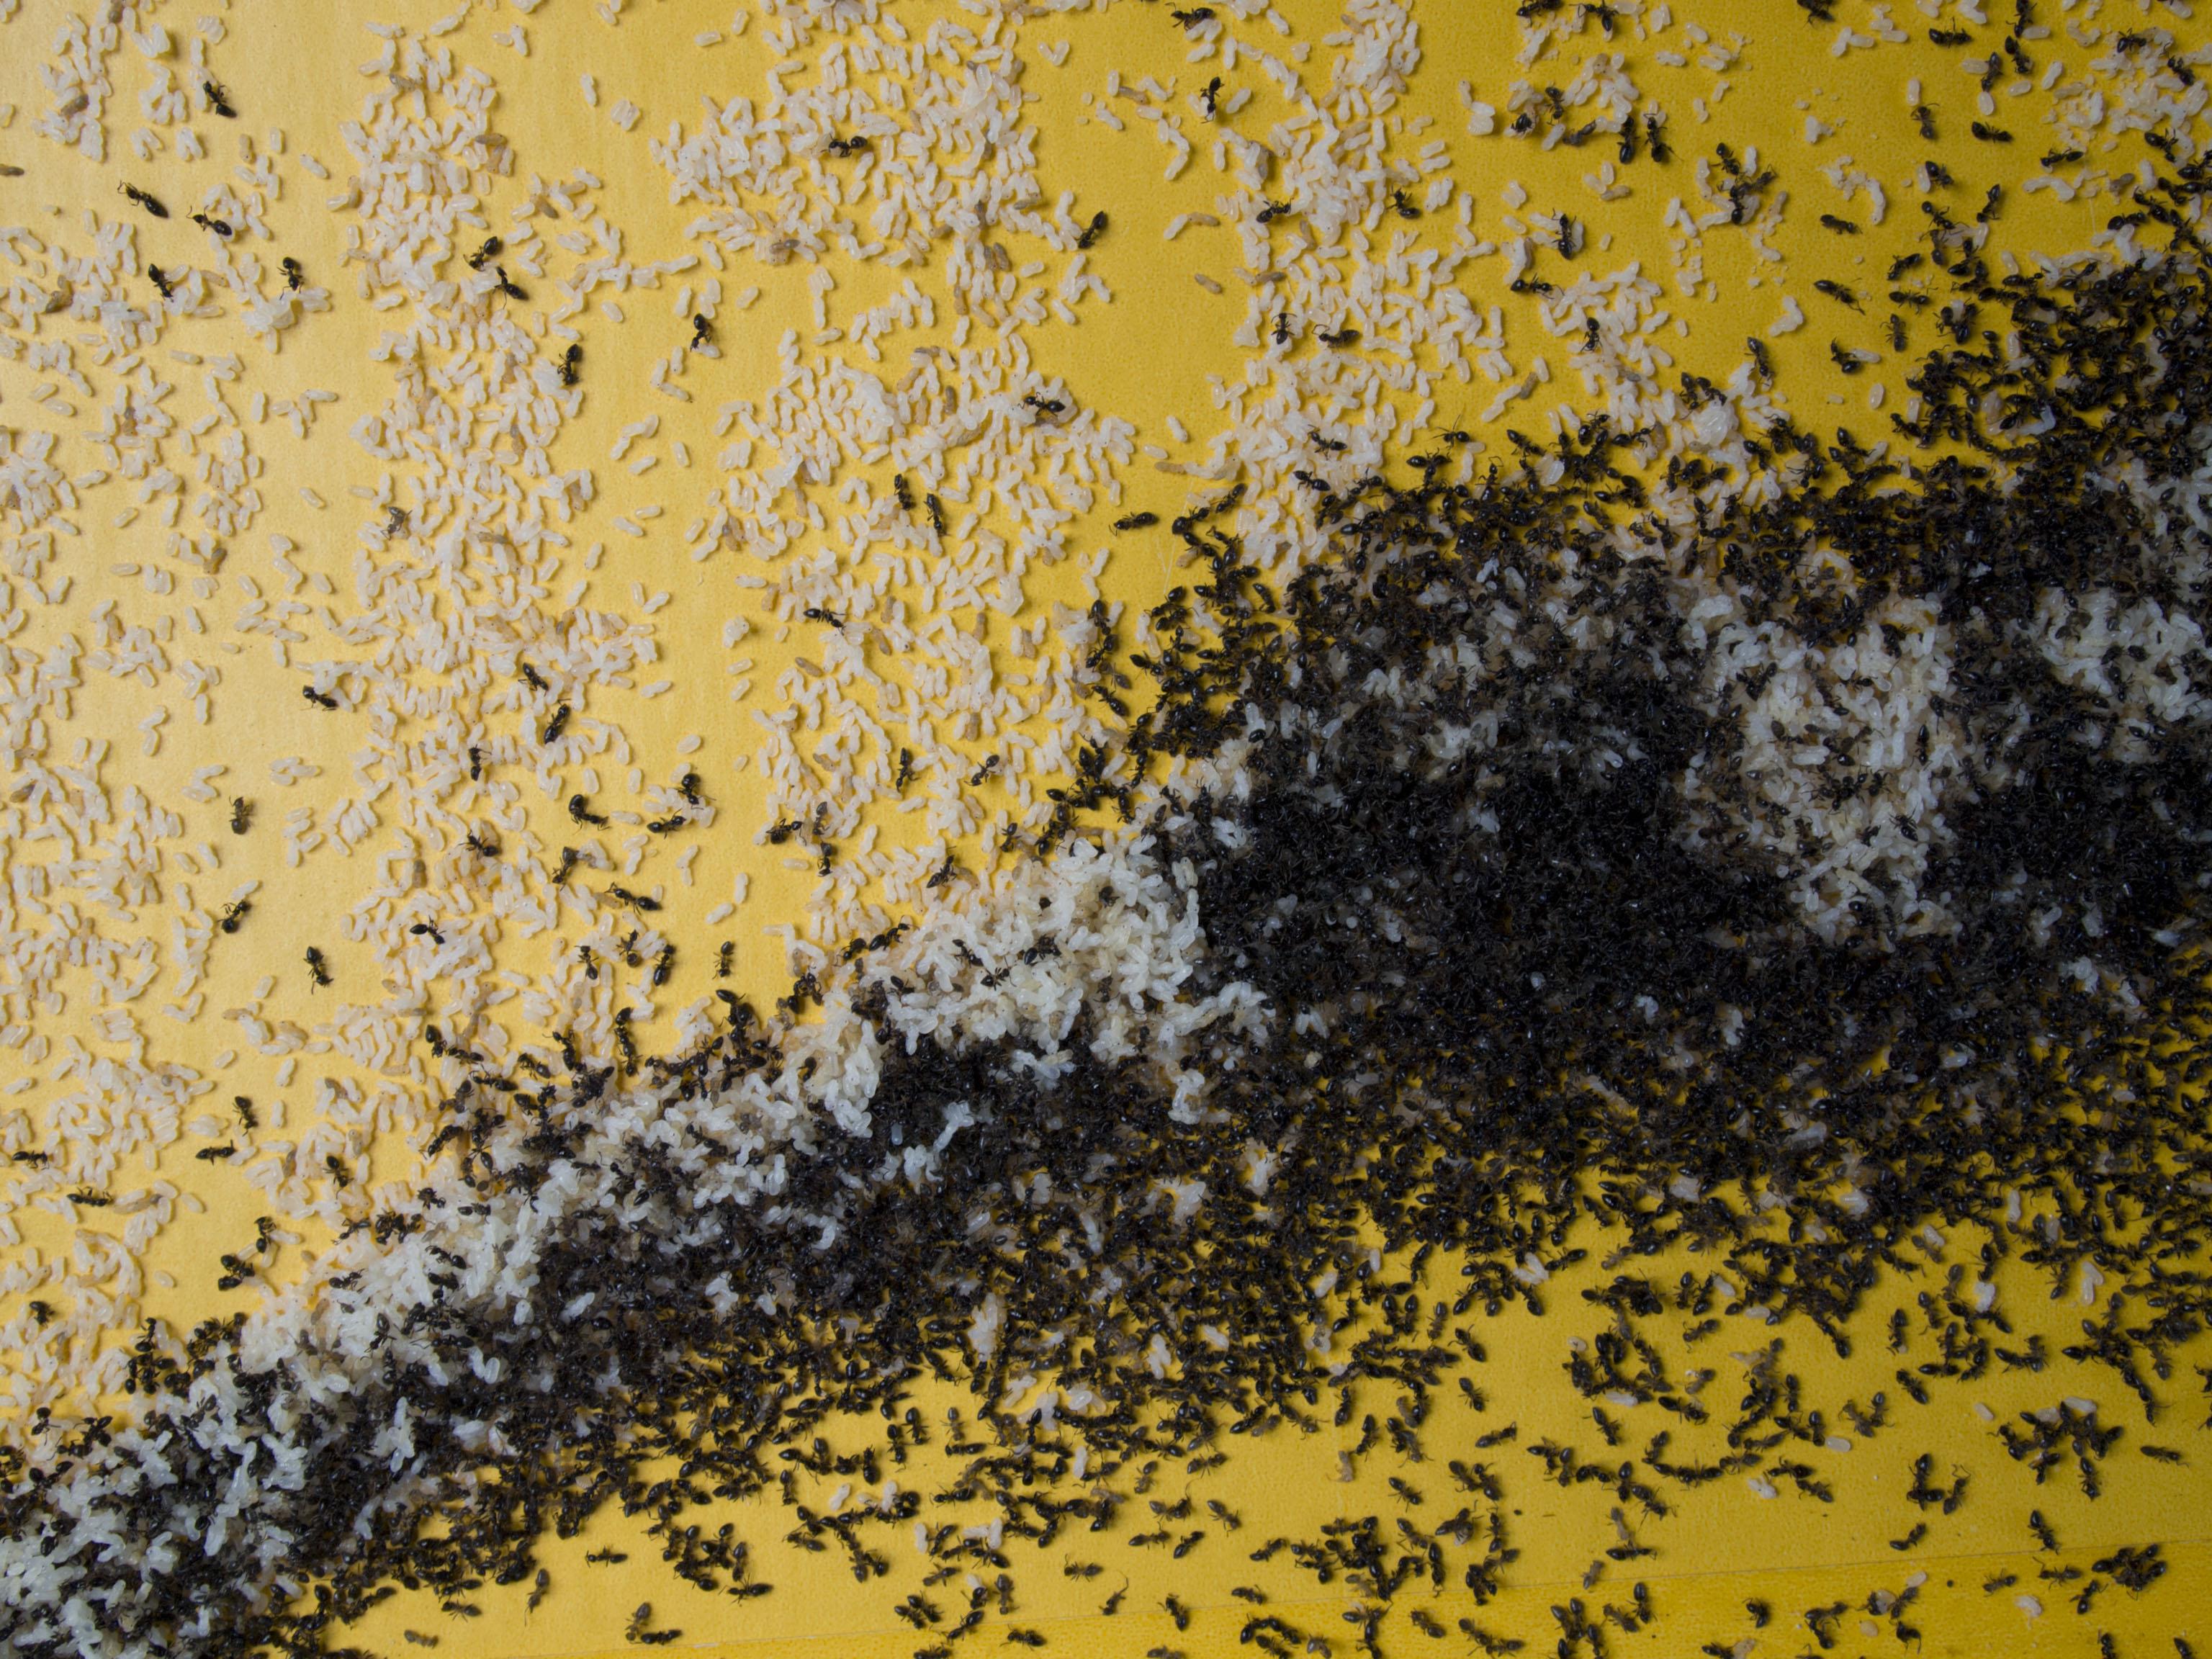 Ants In The Studio Centre For Regional Arts Practice